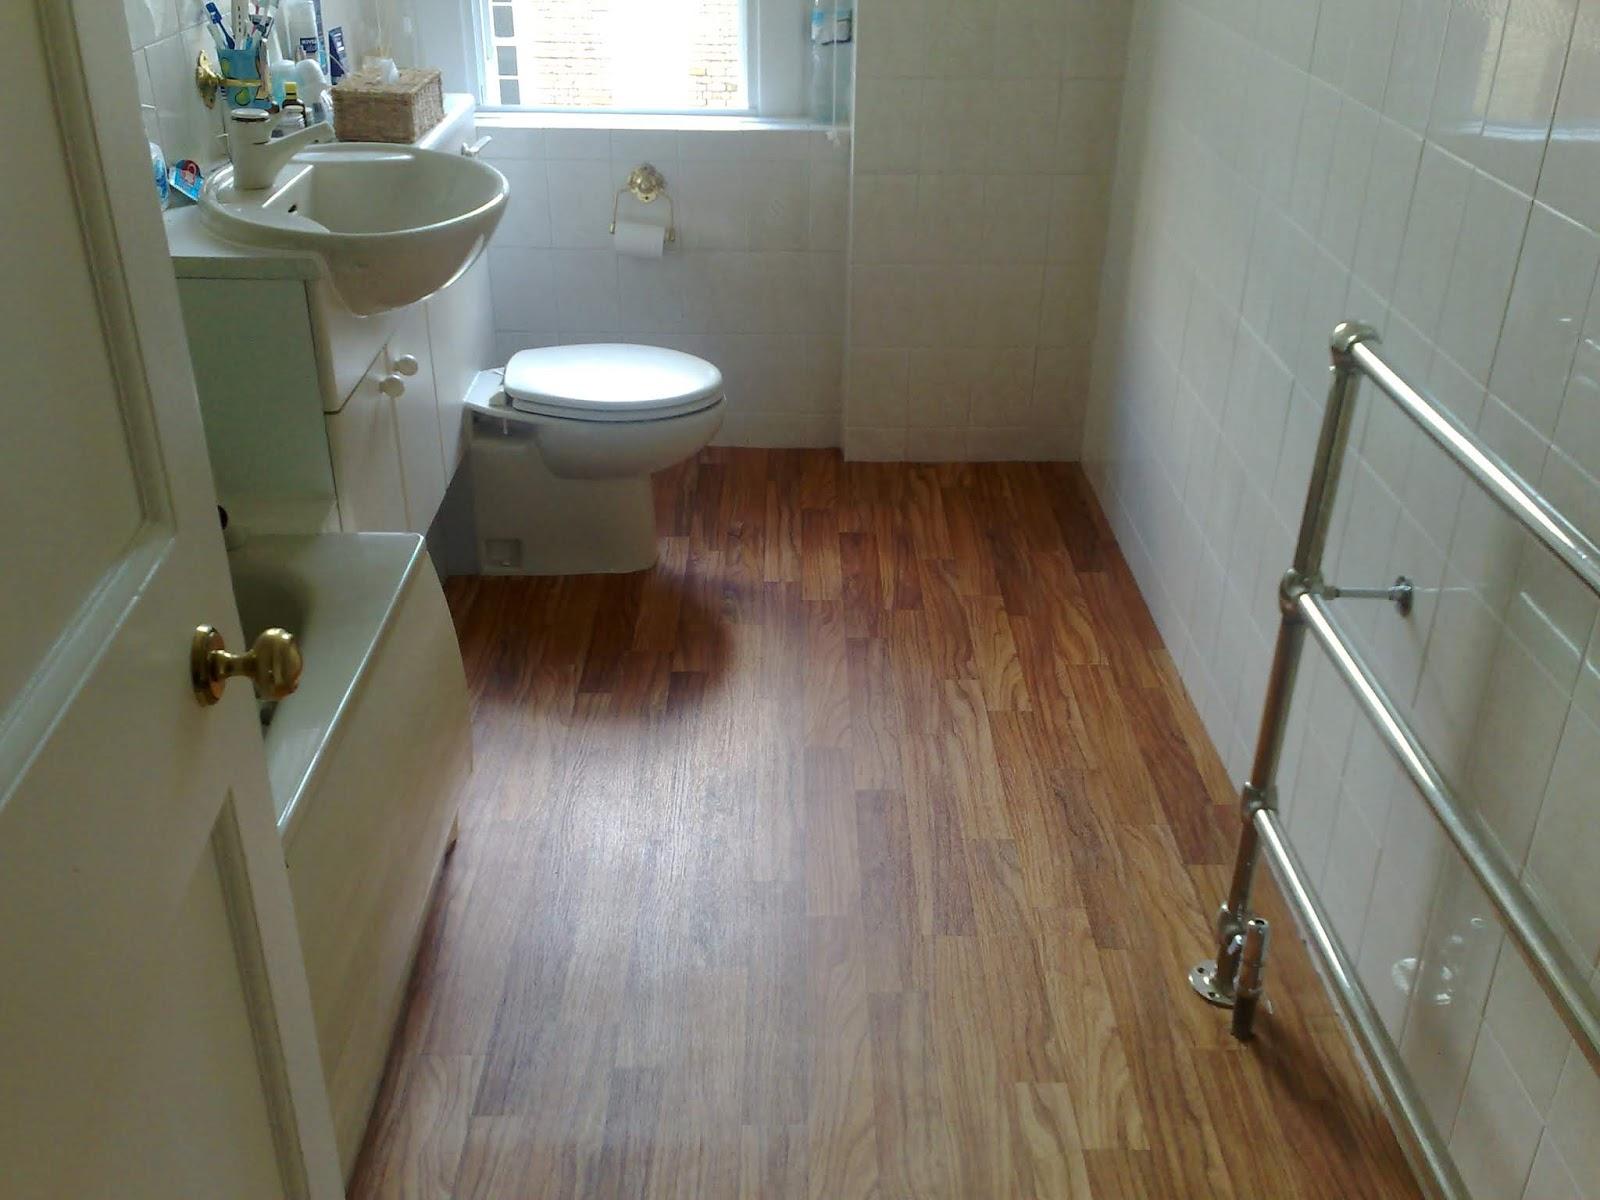 +55 Modern small bathroom design makeover ideas 2019 on Small Bathroom Remodel Ideas 2019  id=53755